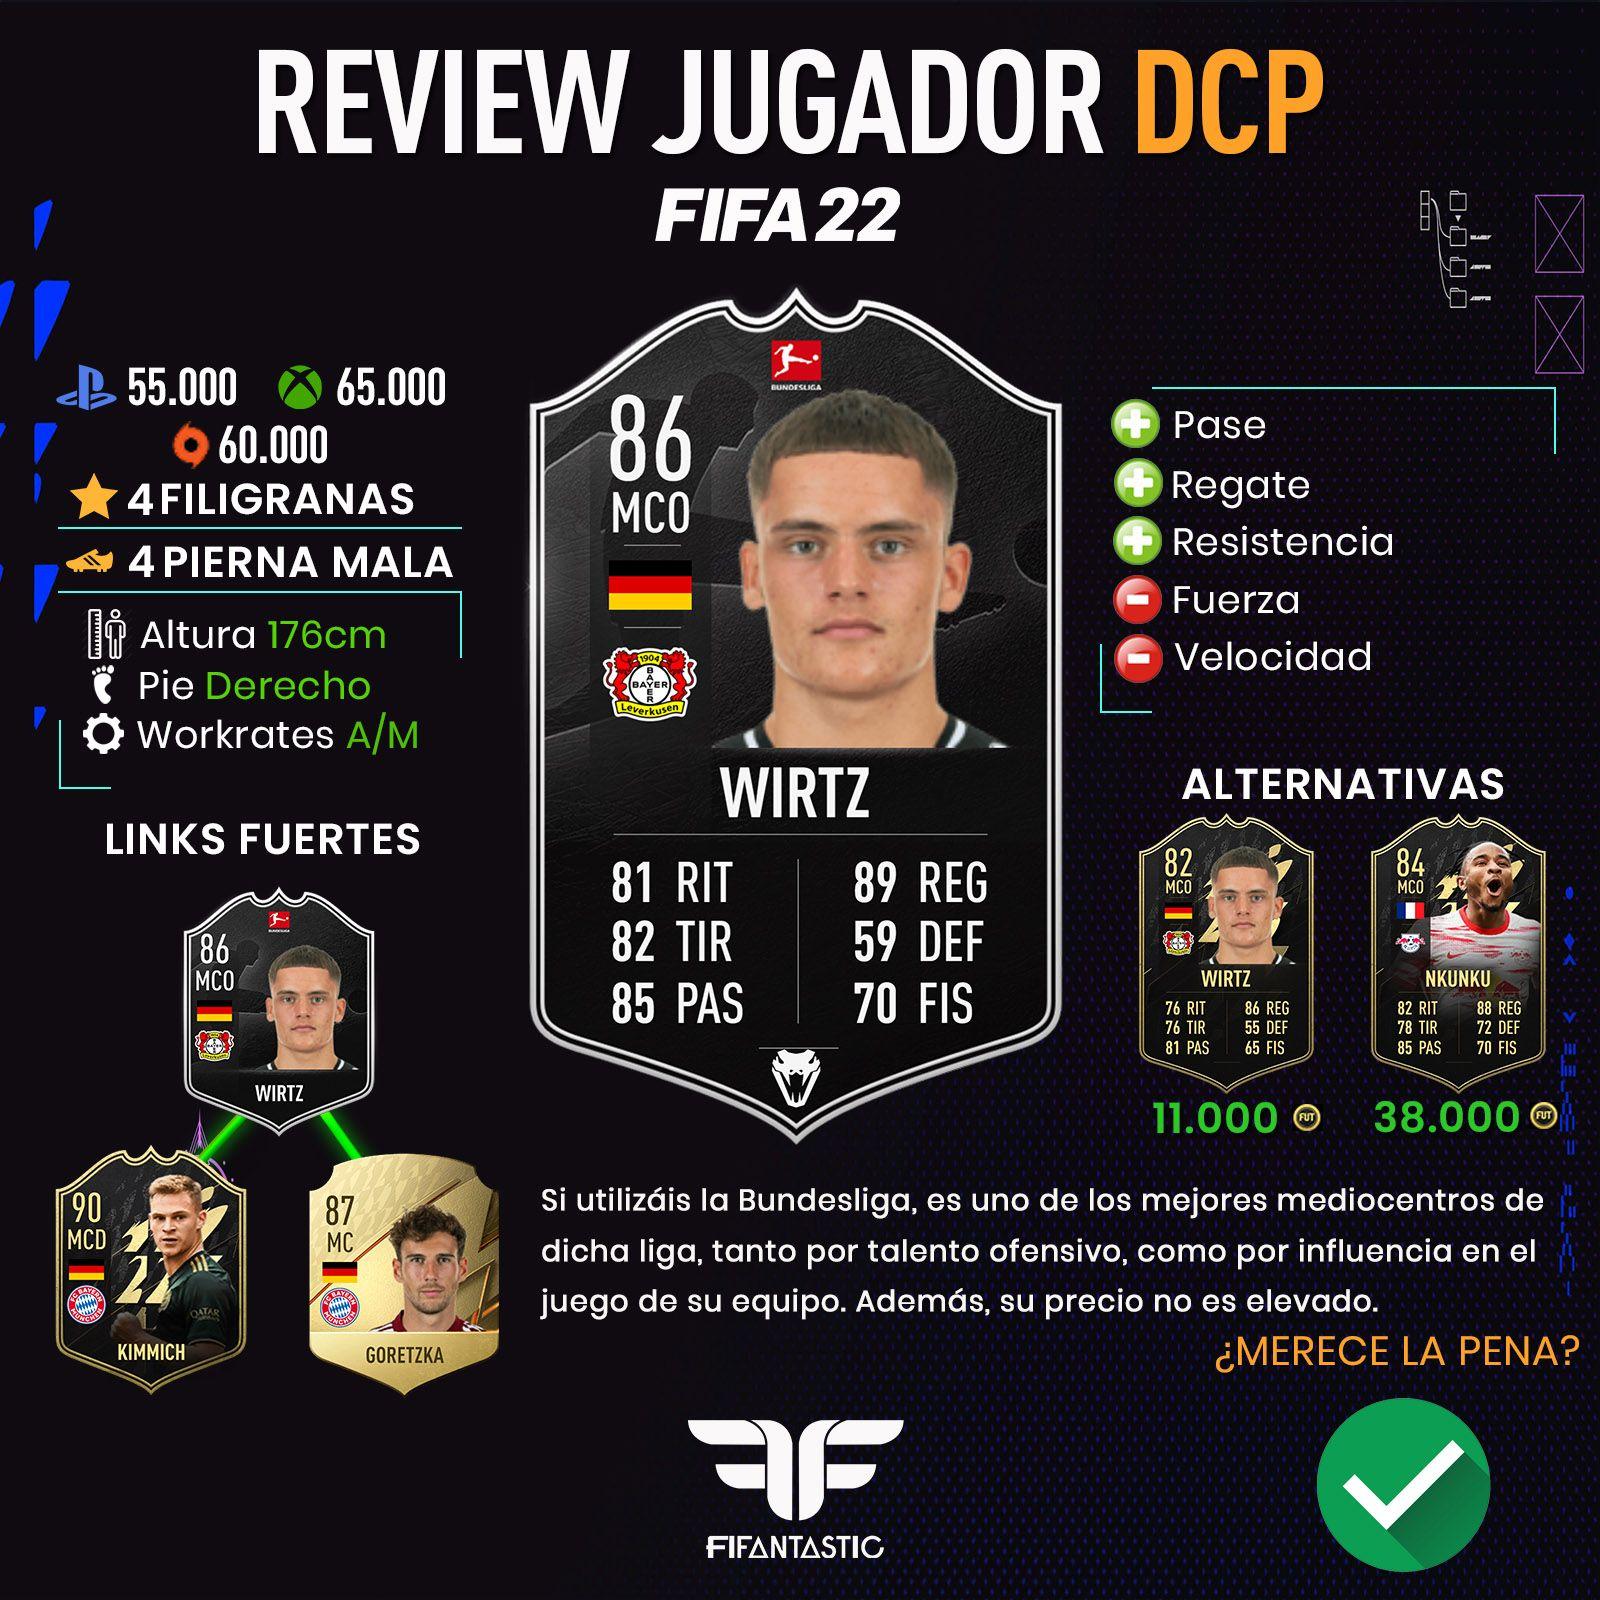 Wirtz POTM en FIFA 22 Ultimate Team